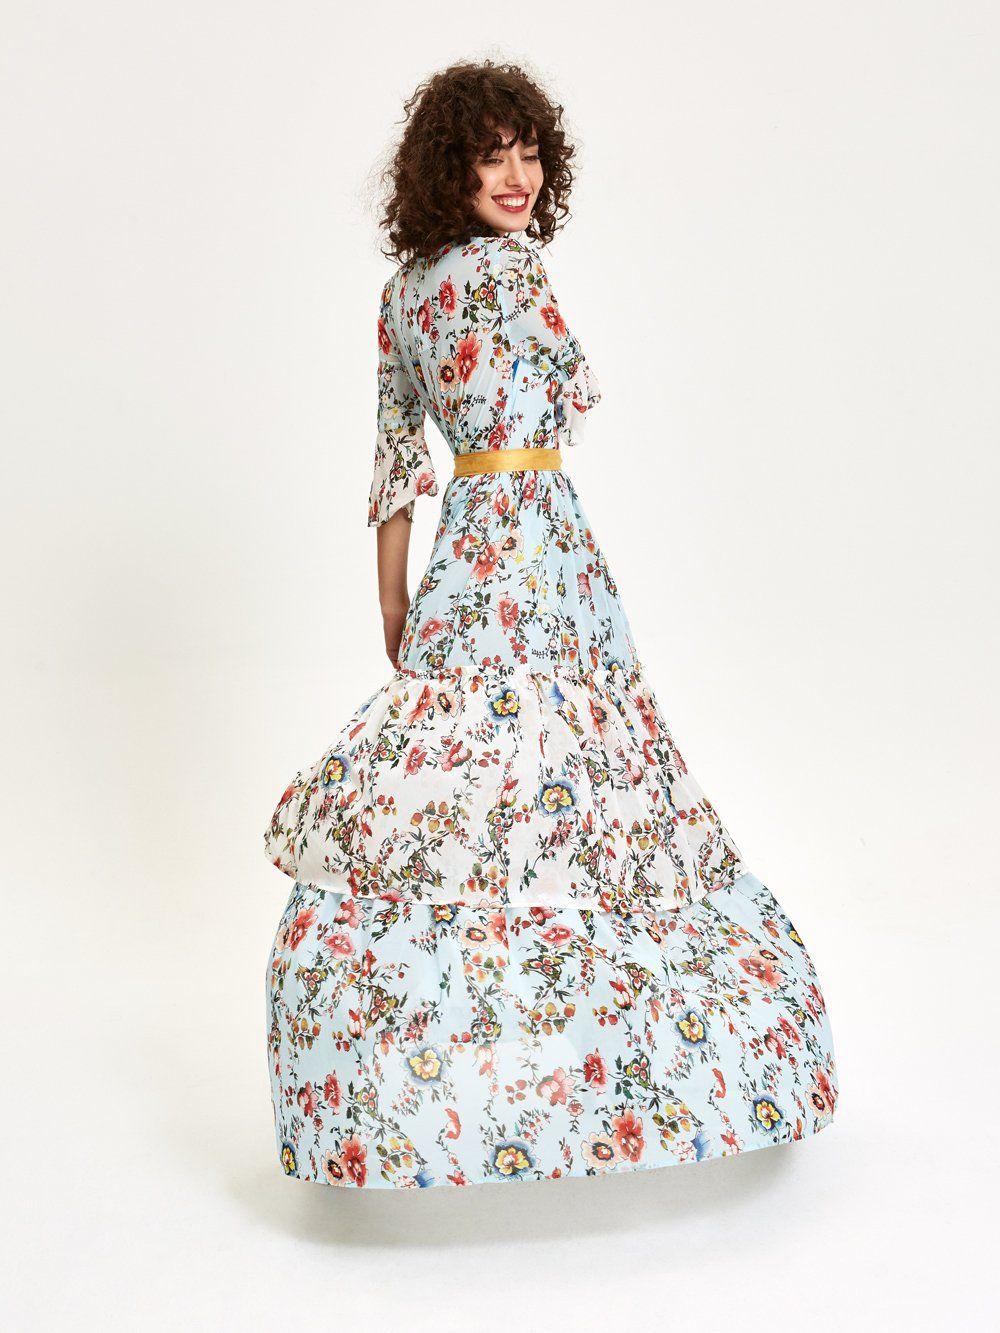 651c46d9e MIOH - TURQUESA - Maxi Vestido Estampado Floral para invitada de boda